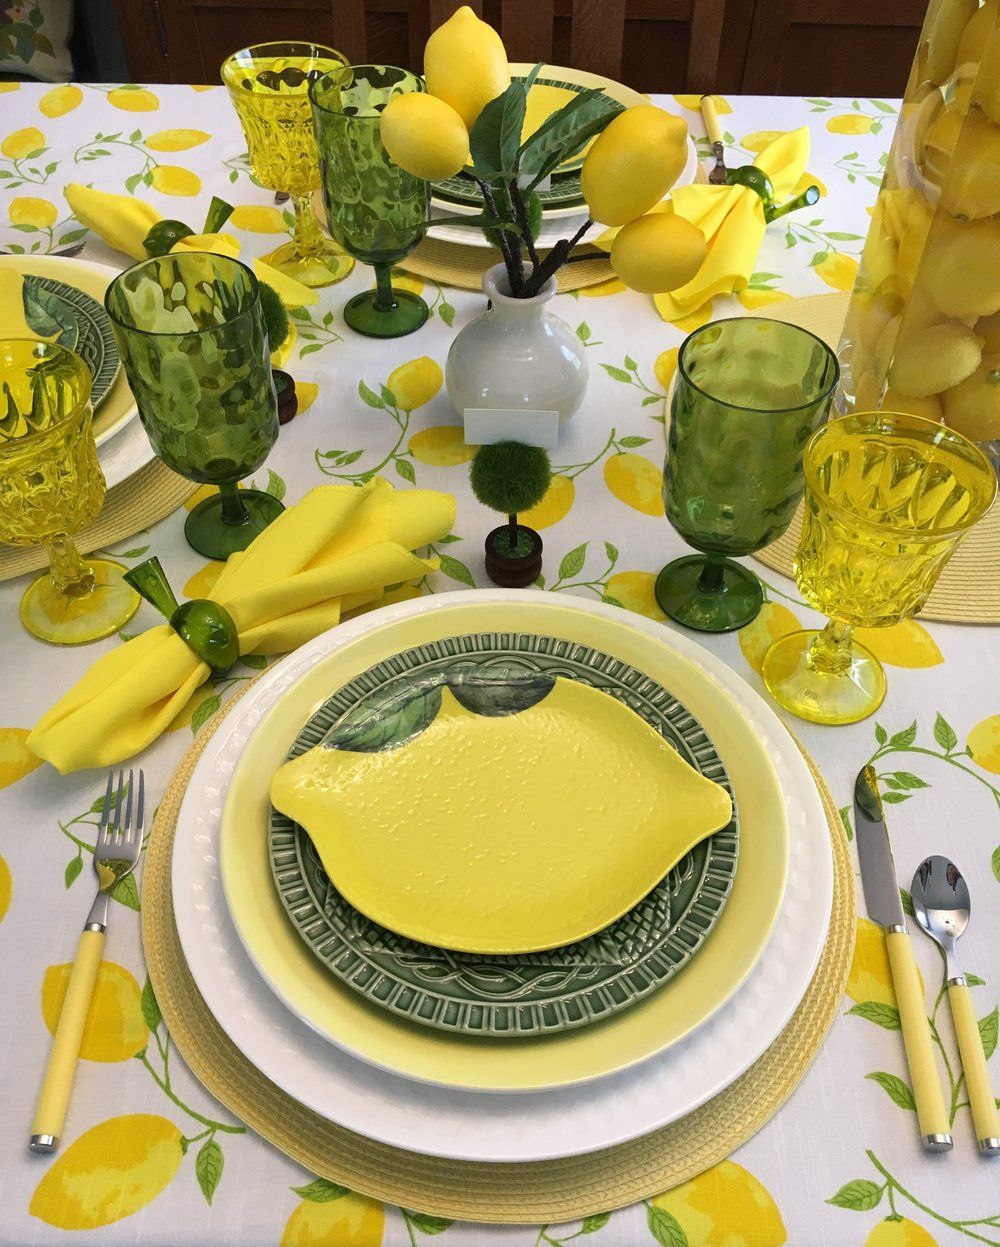 2019 04 30b Jpg Lemon Tablescape Lemon Table Decor Lemon Decor